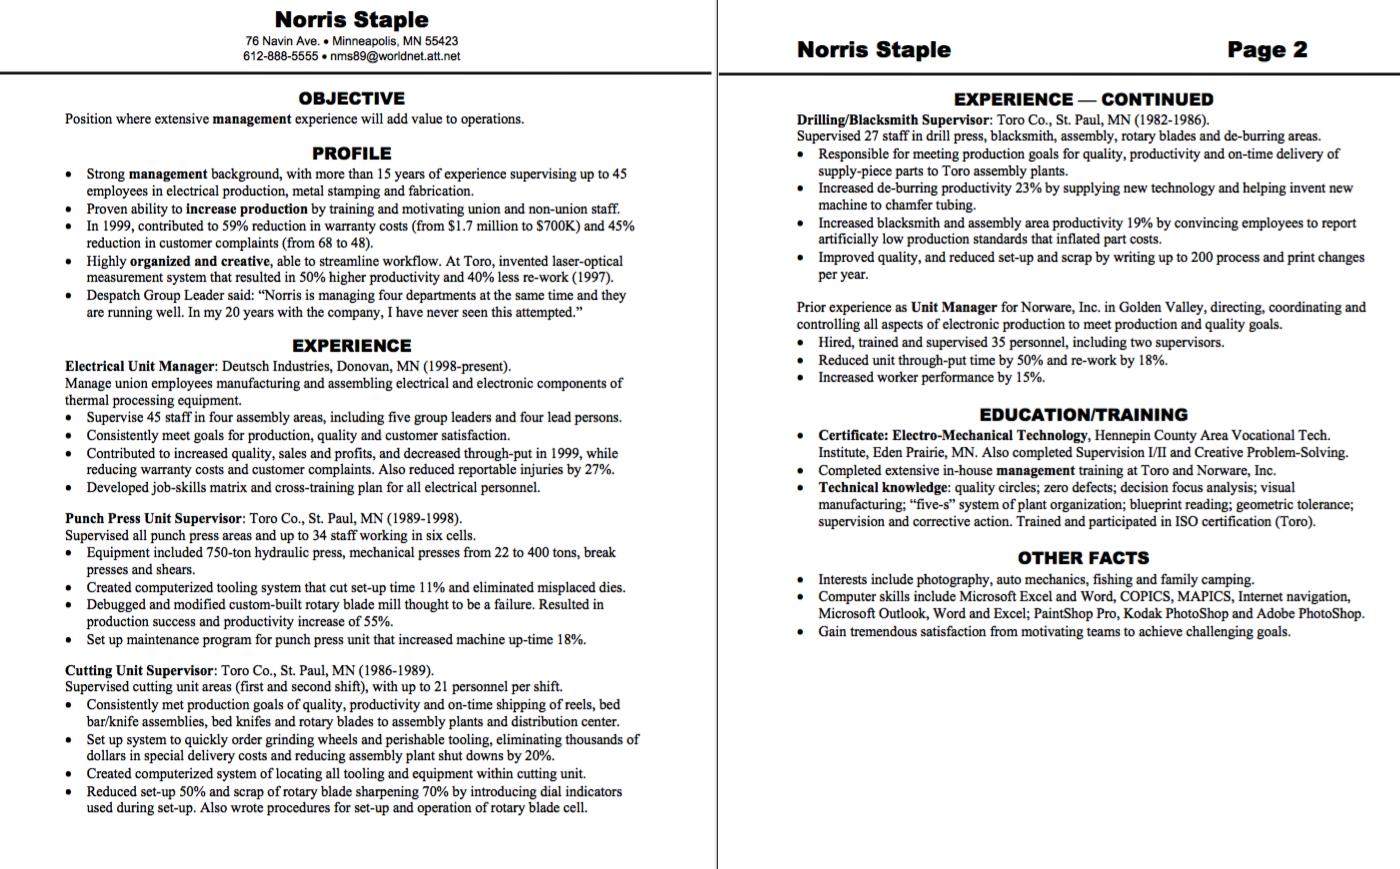 electrical unit manager resume sample - http://exampleresumecv.org ...